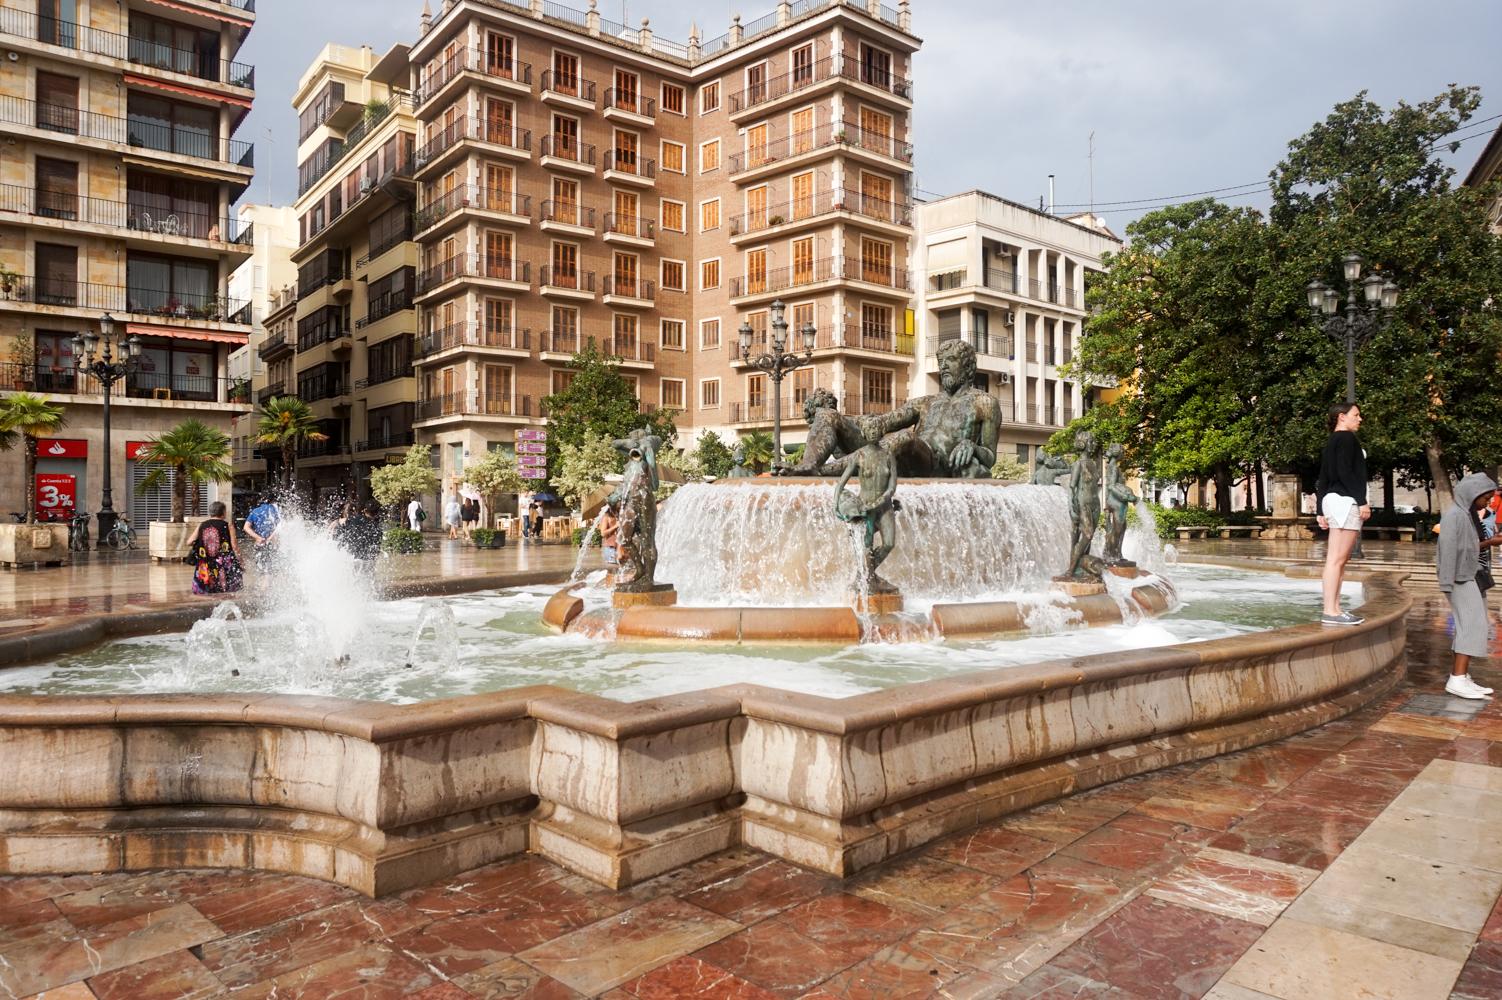 Fountain in Valencia Spain